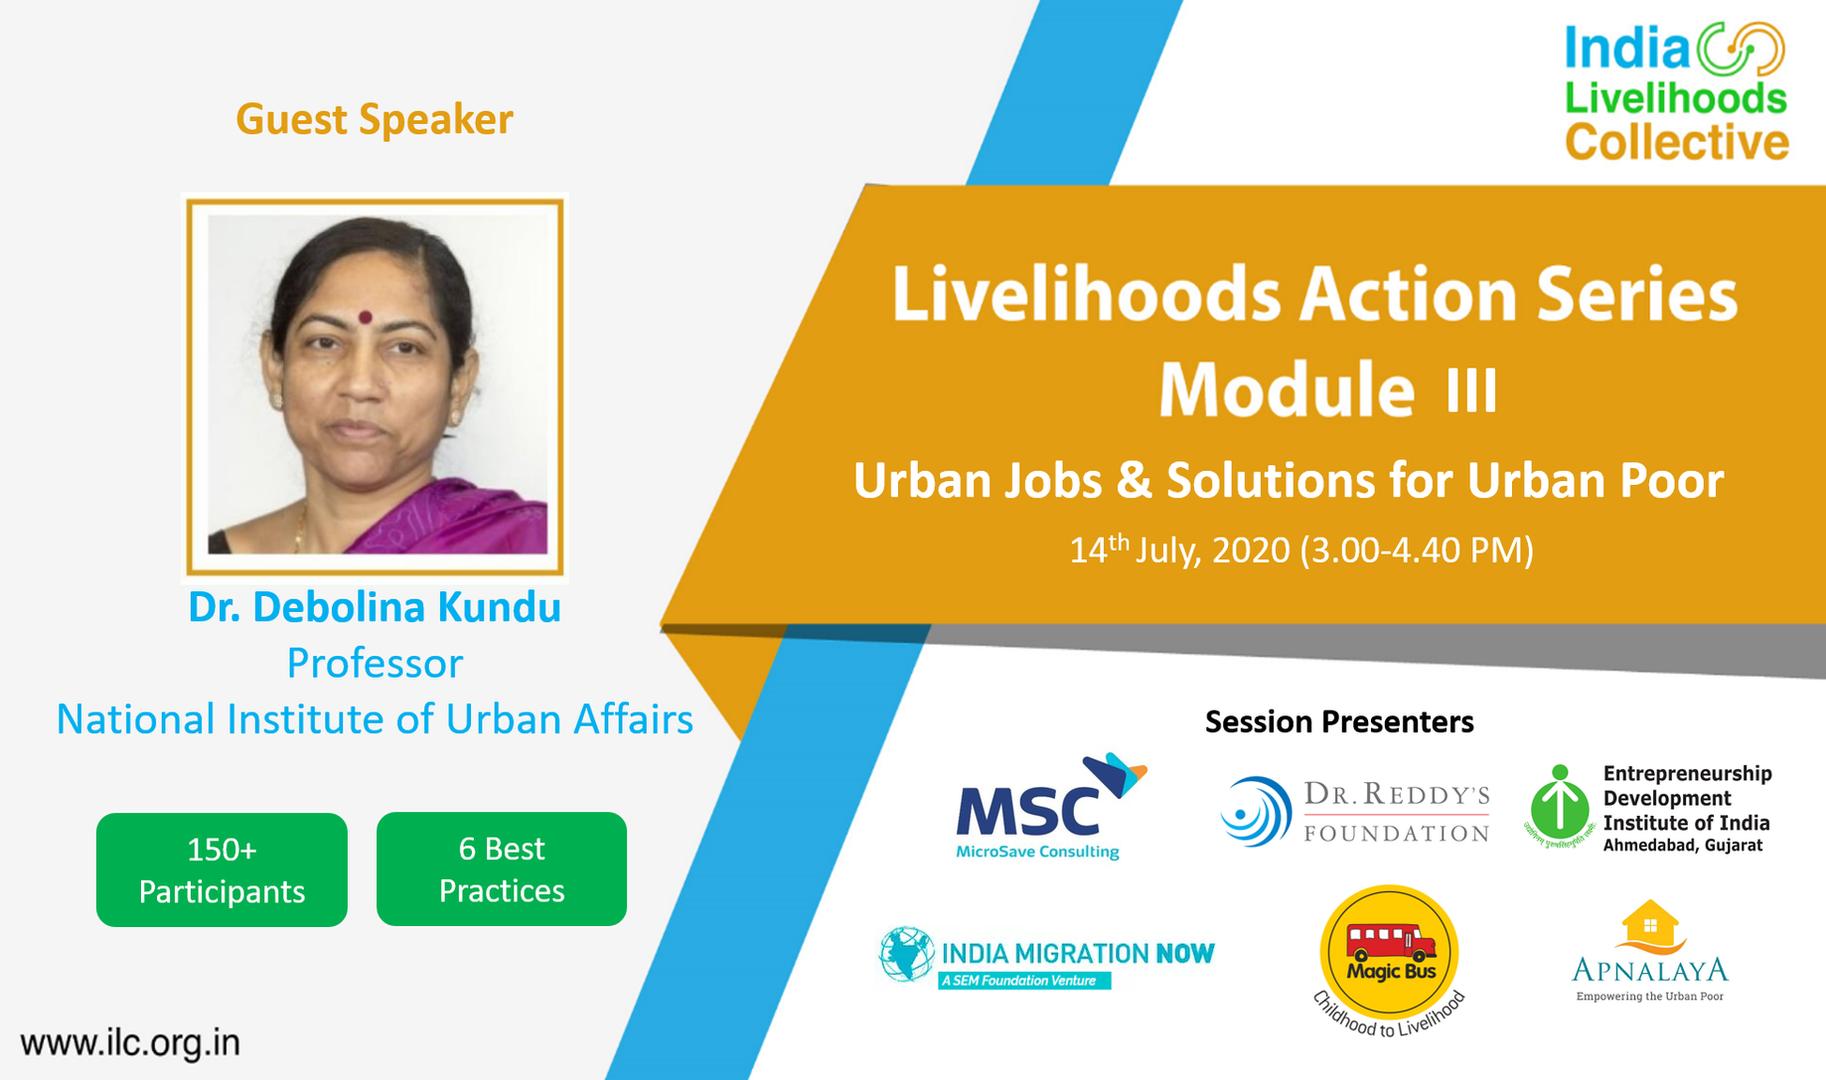 Urban Jobs & Solutions for Urban Poor